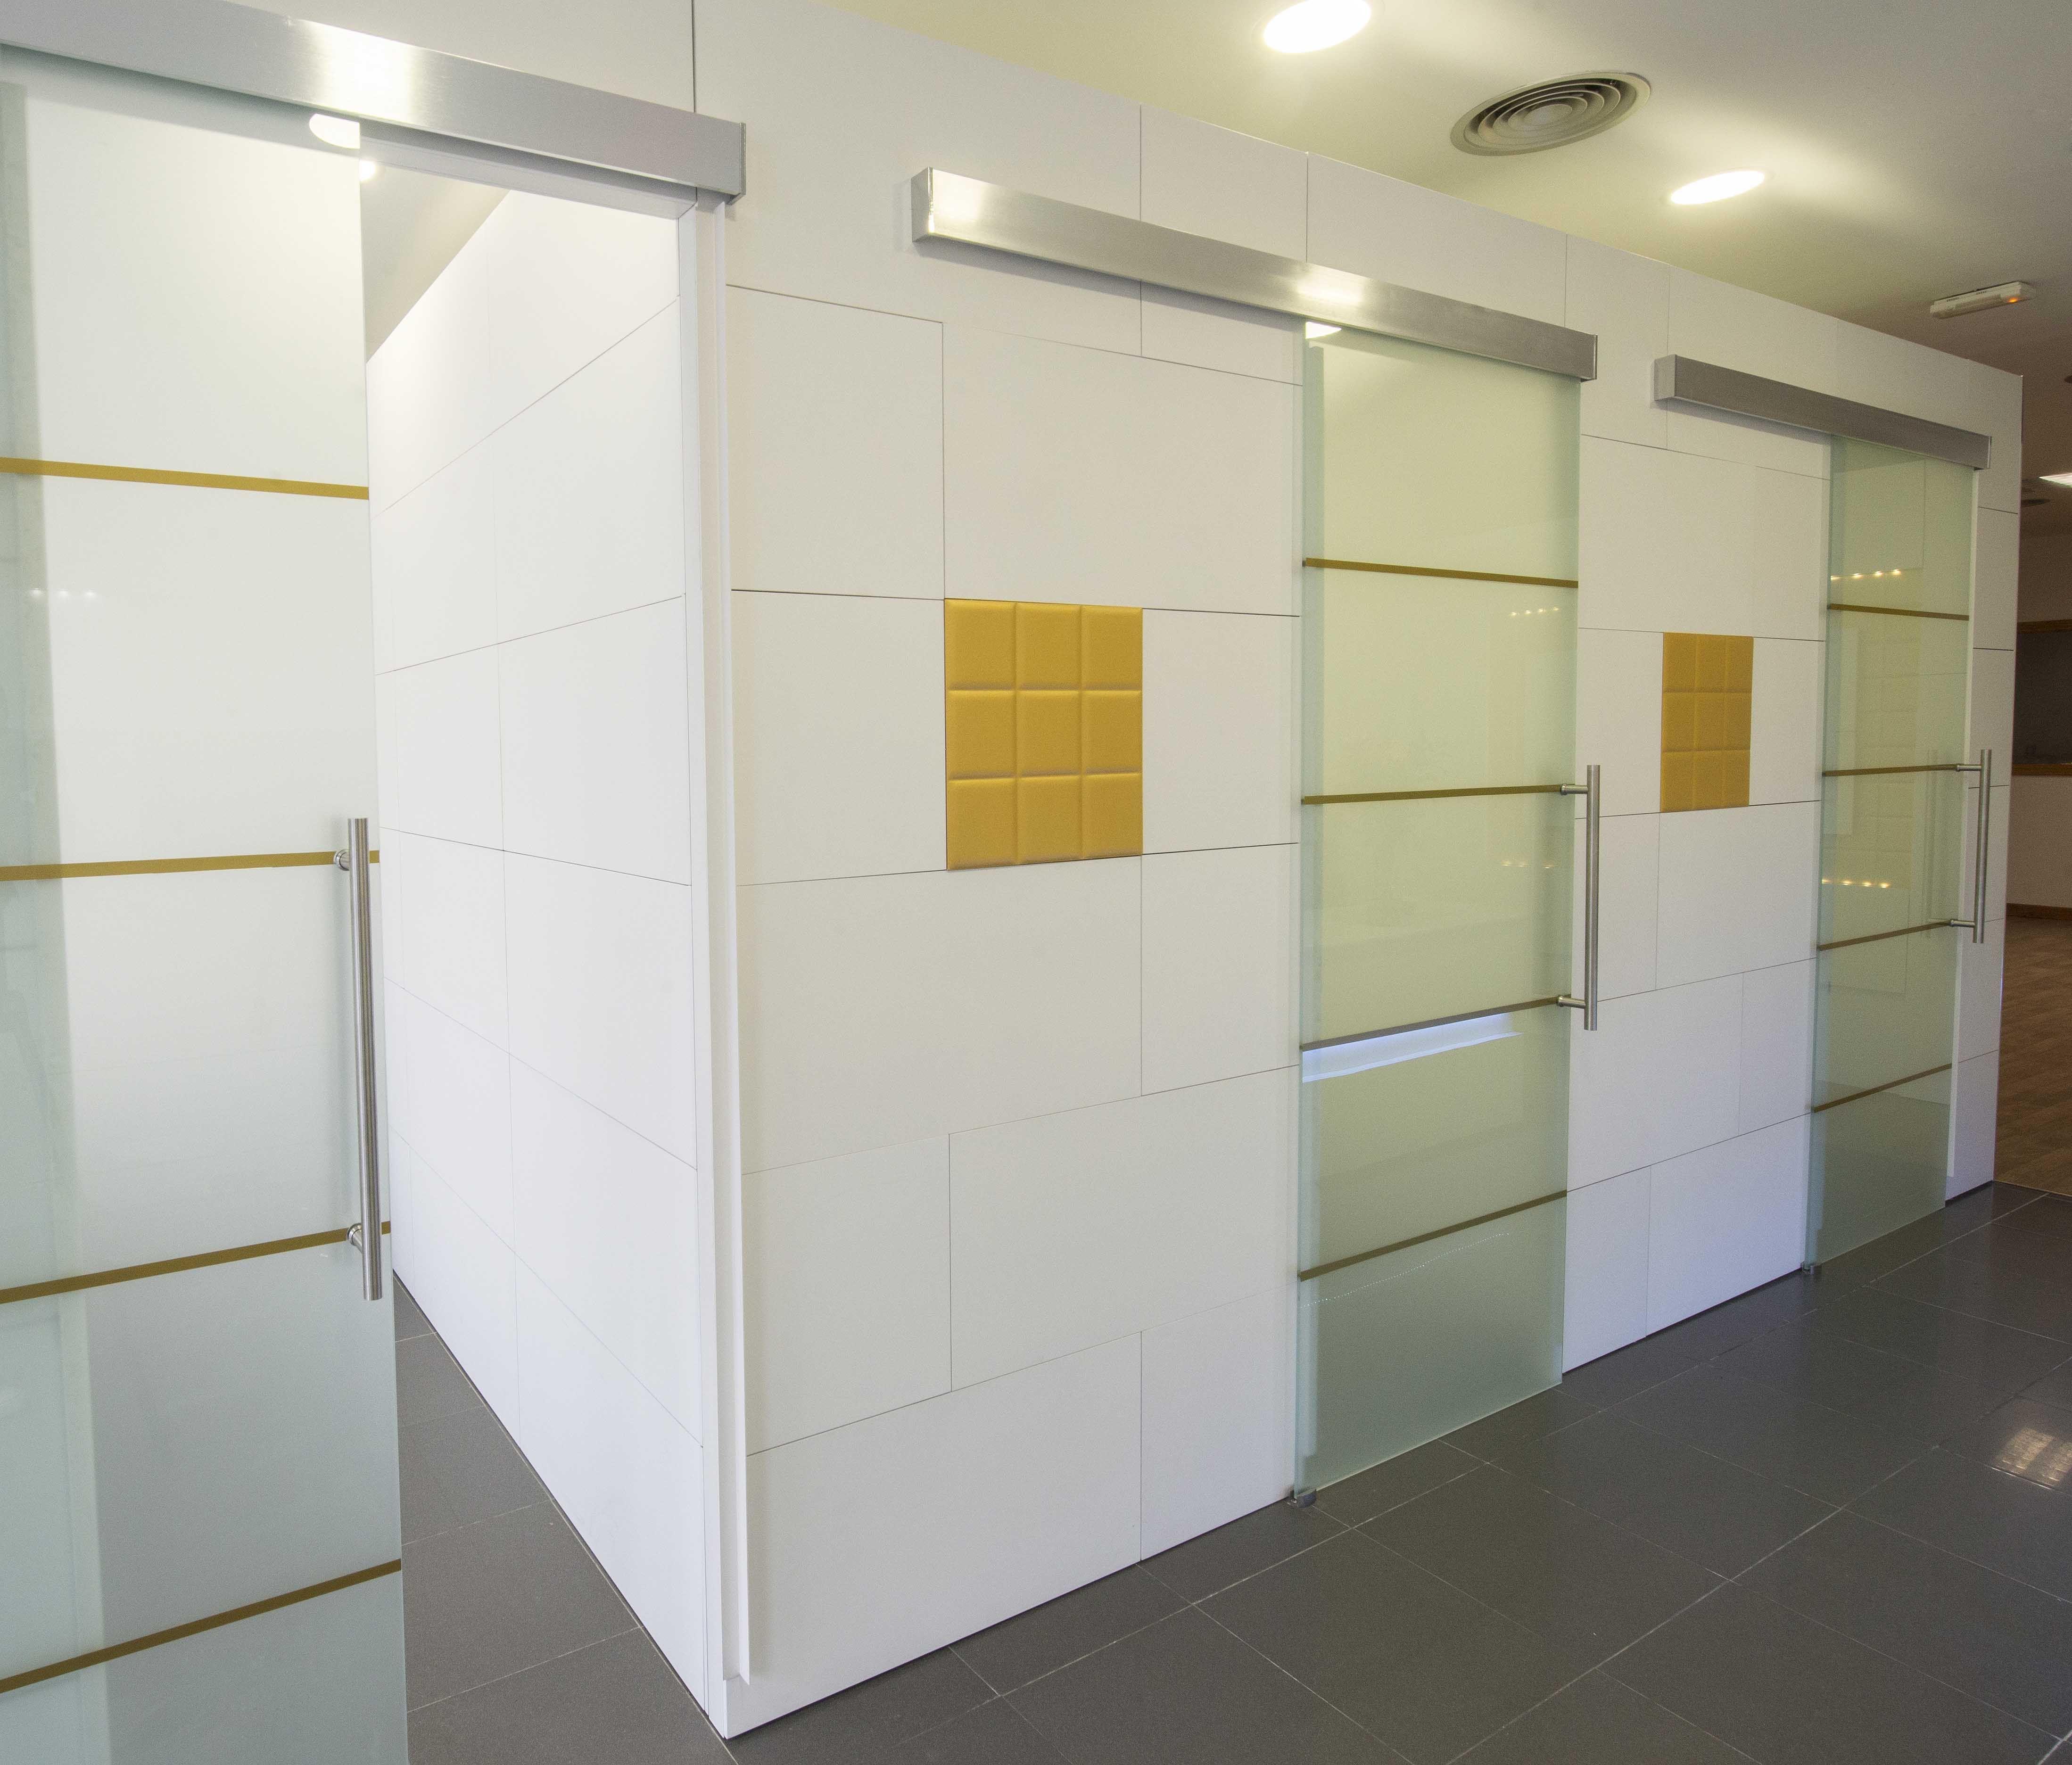 Tabiques separadores de ambientes de serastone para centro for Decoracion centro estetica